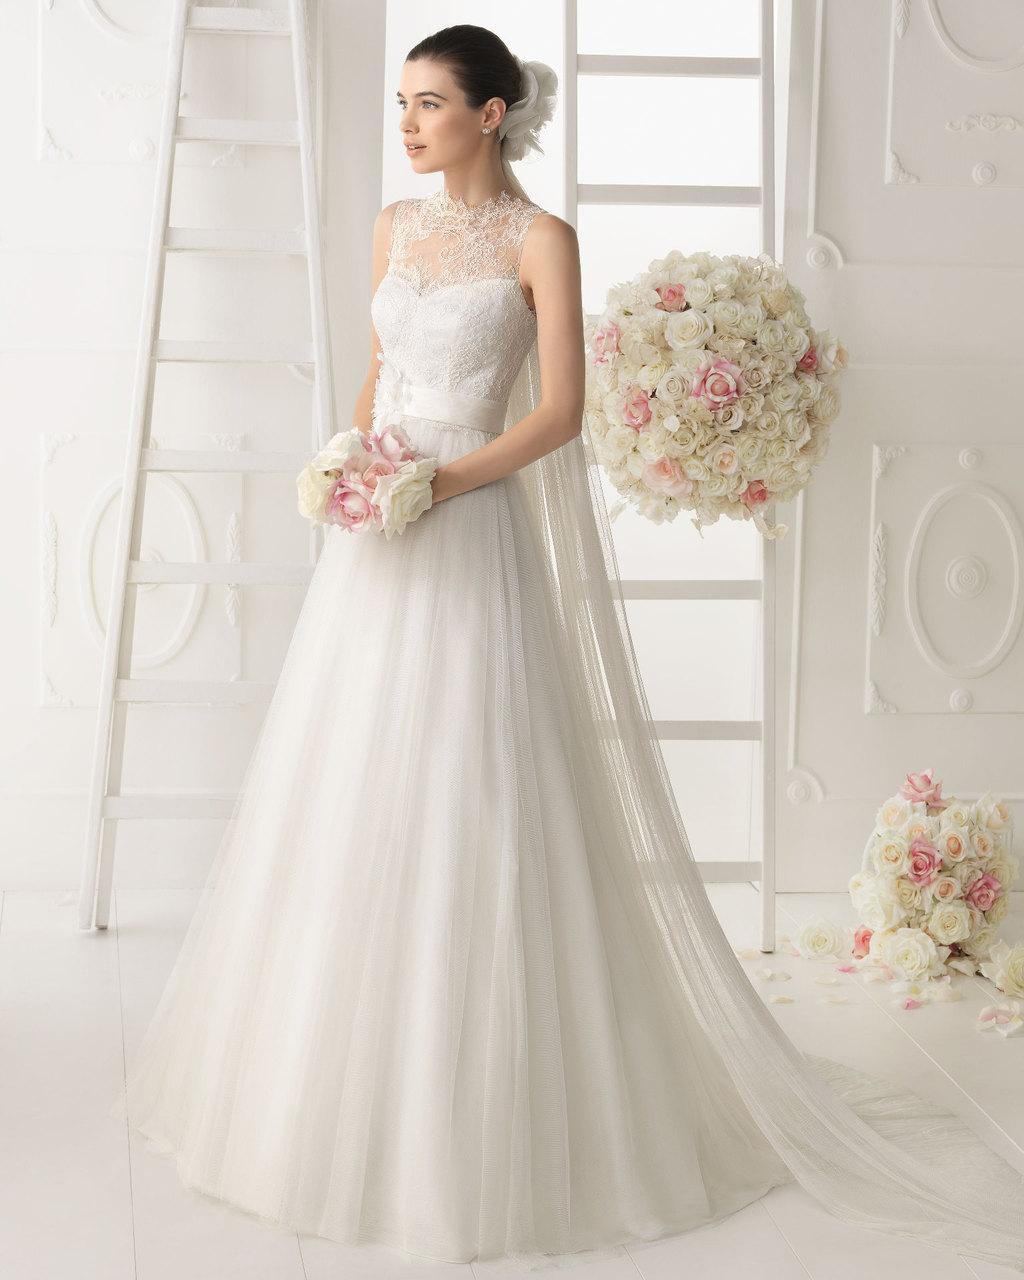 Aire-barcelona-wedding-dress-2014-bridal-ocaso.full